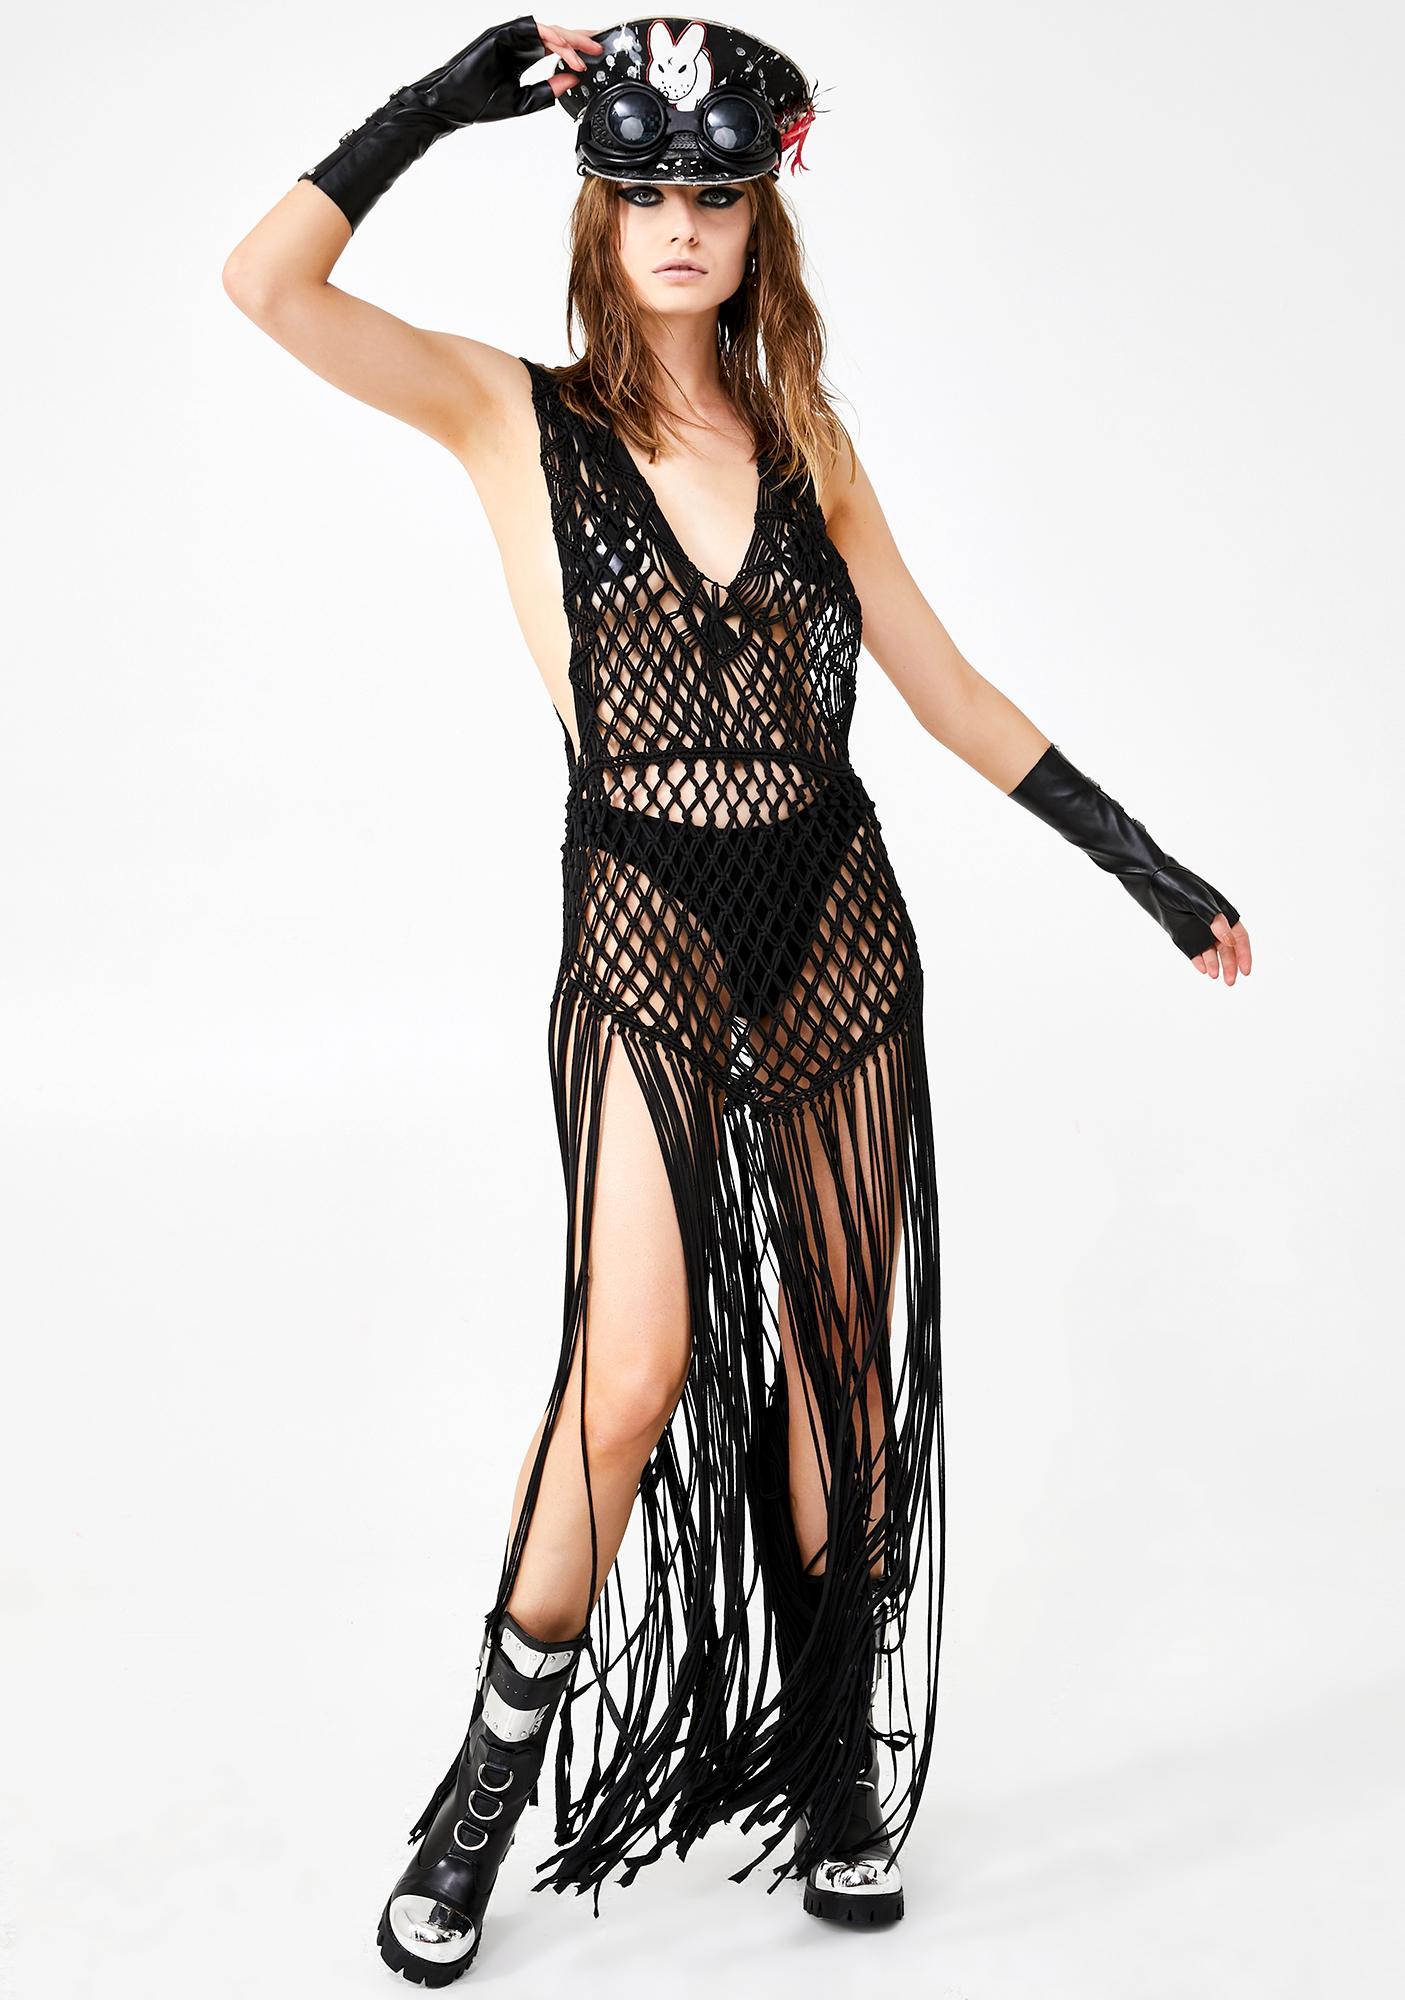 Club Exx Poetic Muse Crochet Dress